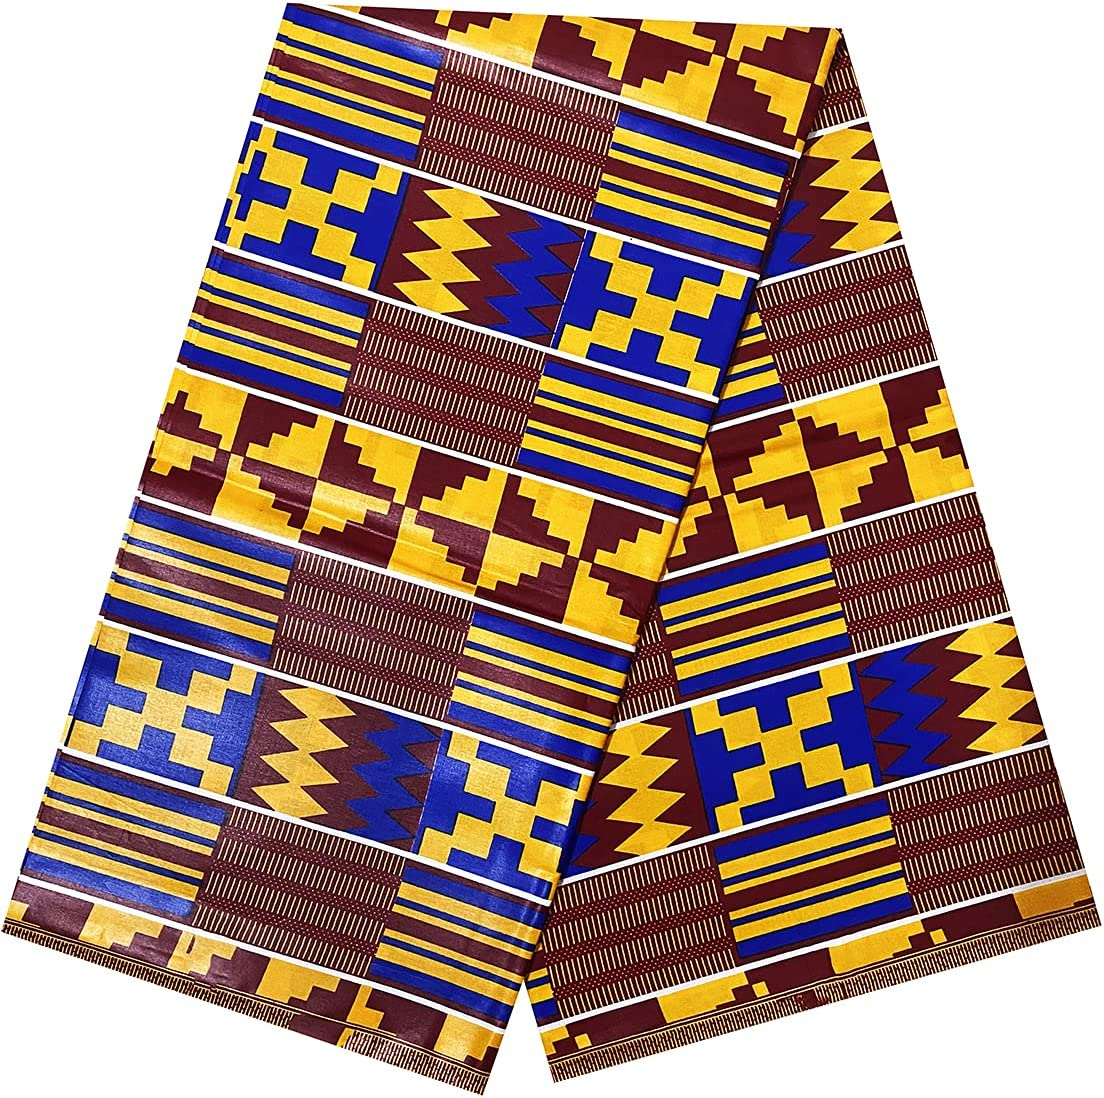 Max 74% OFF Alina Belle Tulsa Mall African Print Wax Kente 3 Fabric A Yard